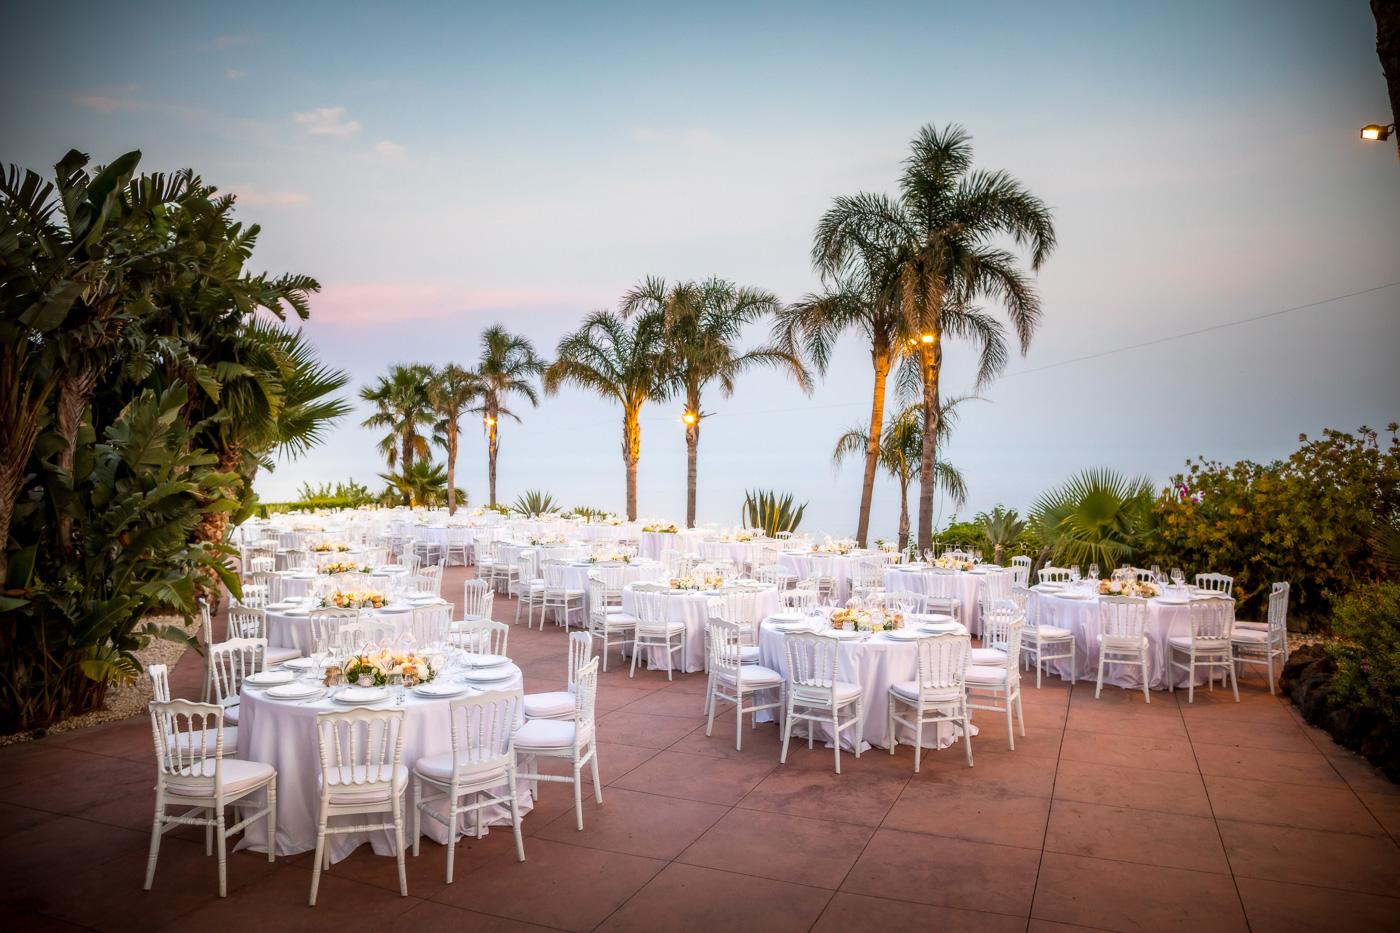 Casa delle Terre Forti Wedding Day _wedding_photographer_sicily_taormina_top_best_videographer-church-sangiuliano-catania-table-setup